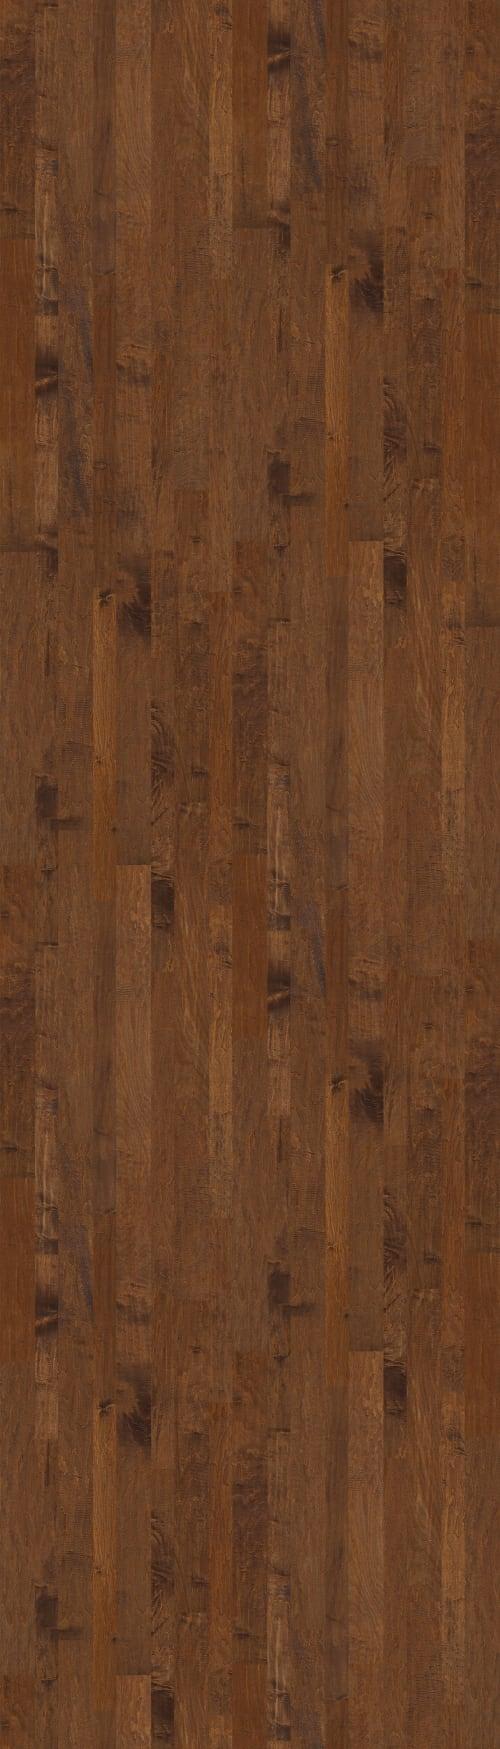 Bennington Maple in Route - Hardwood by Shaw Flooring